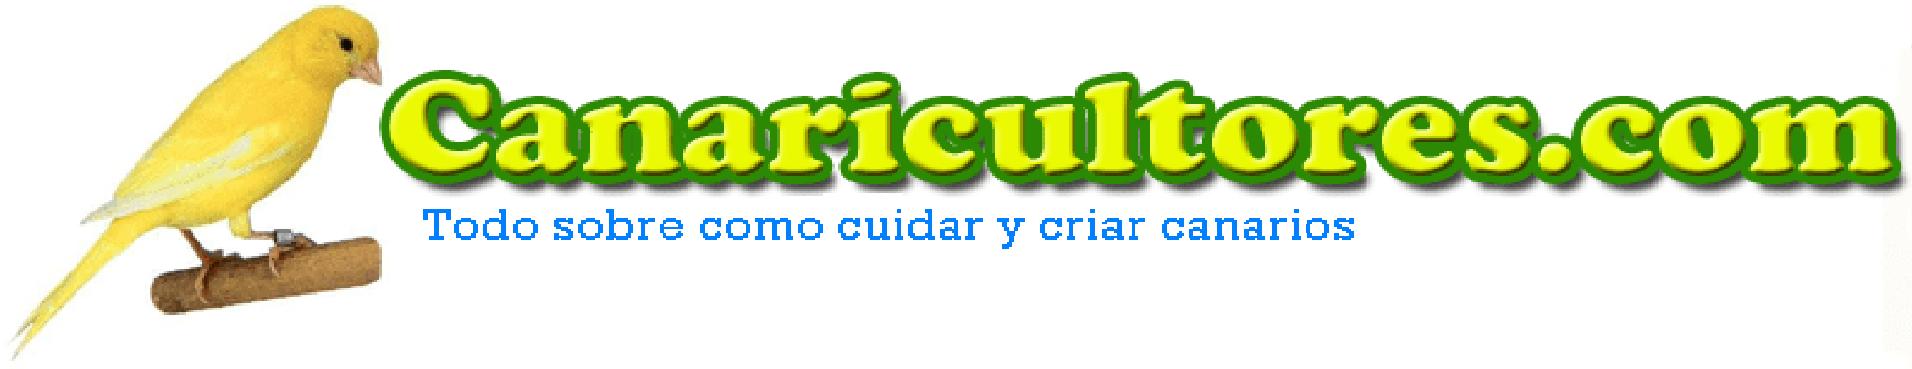 canaricultores.com